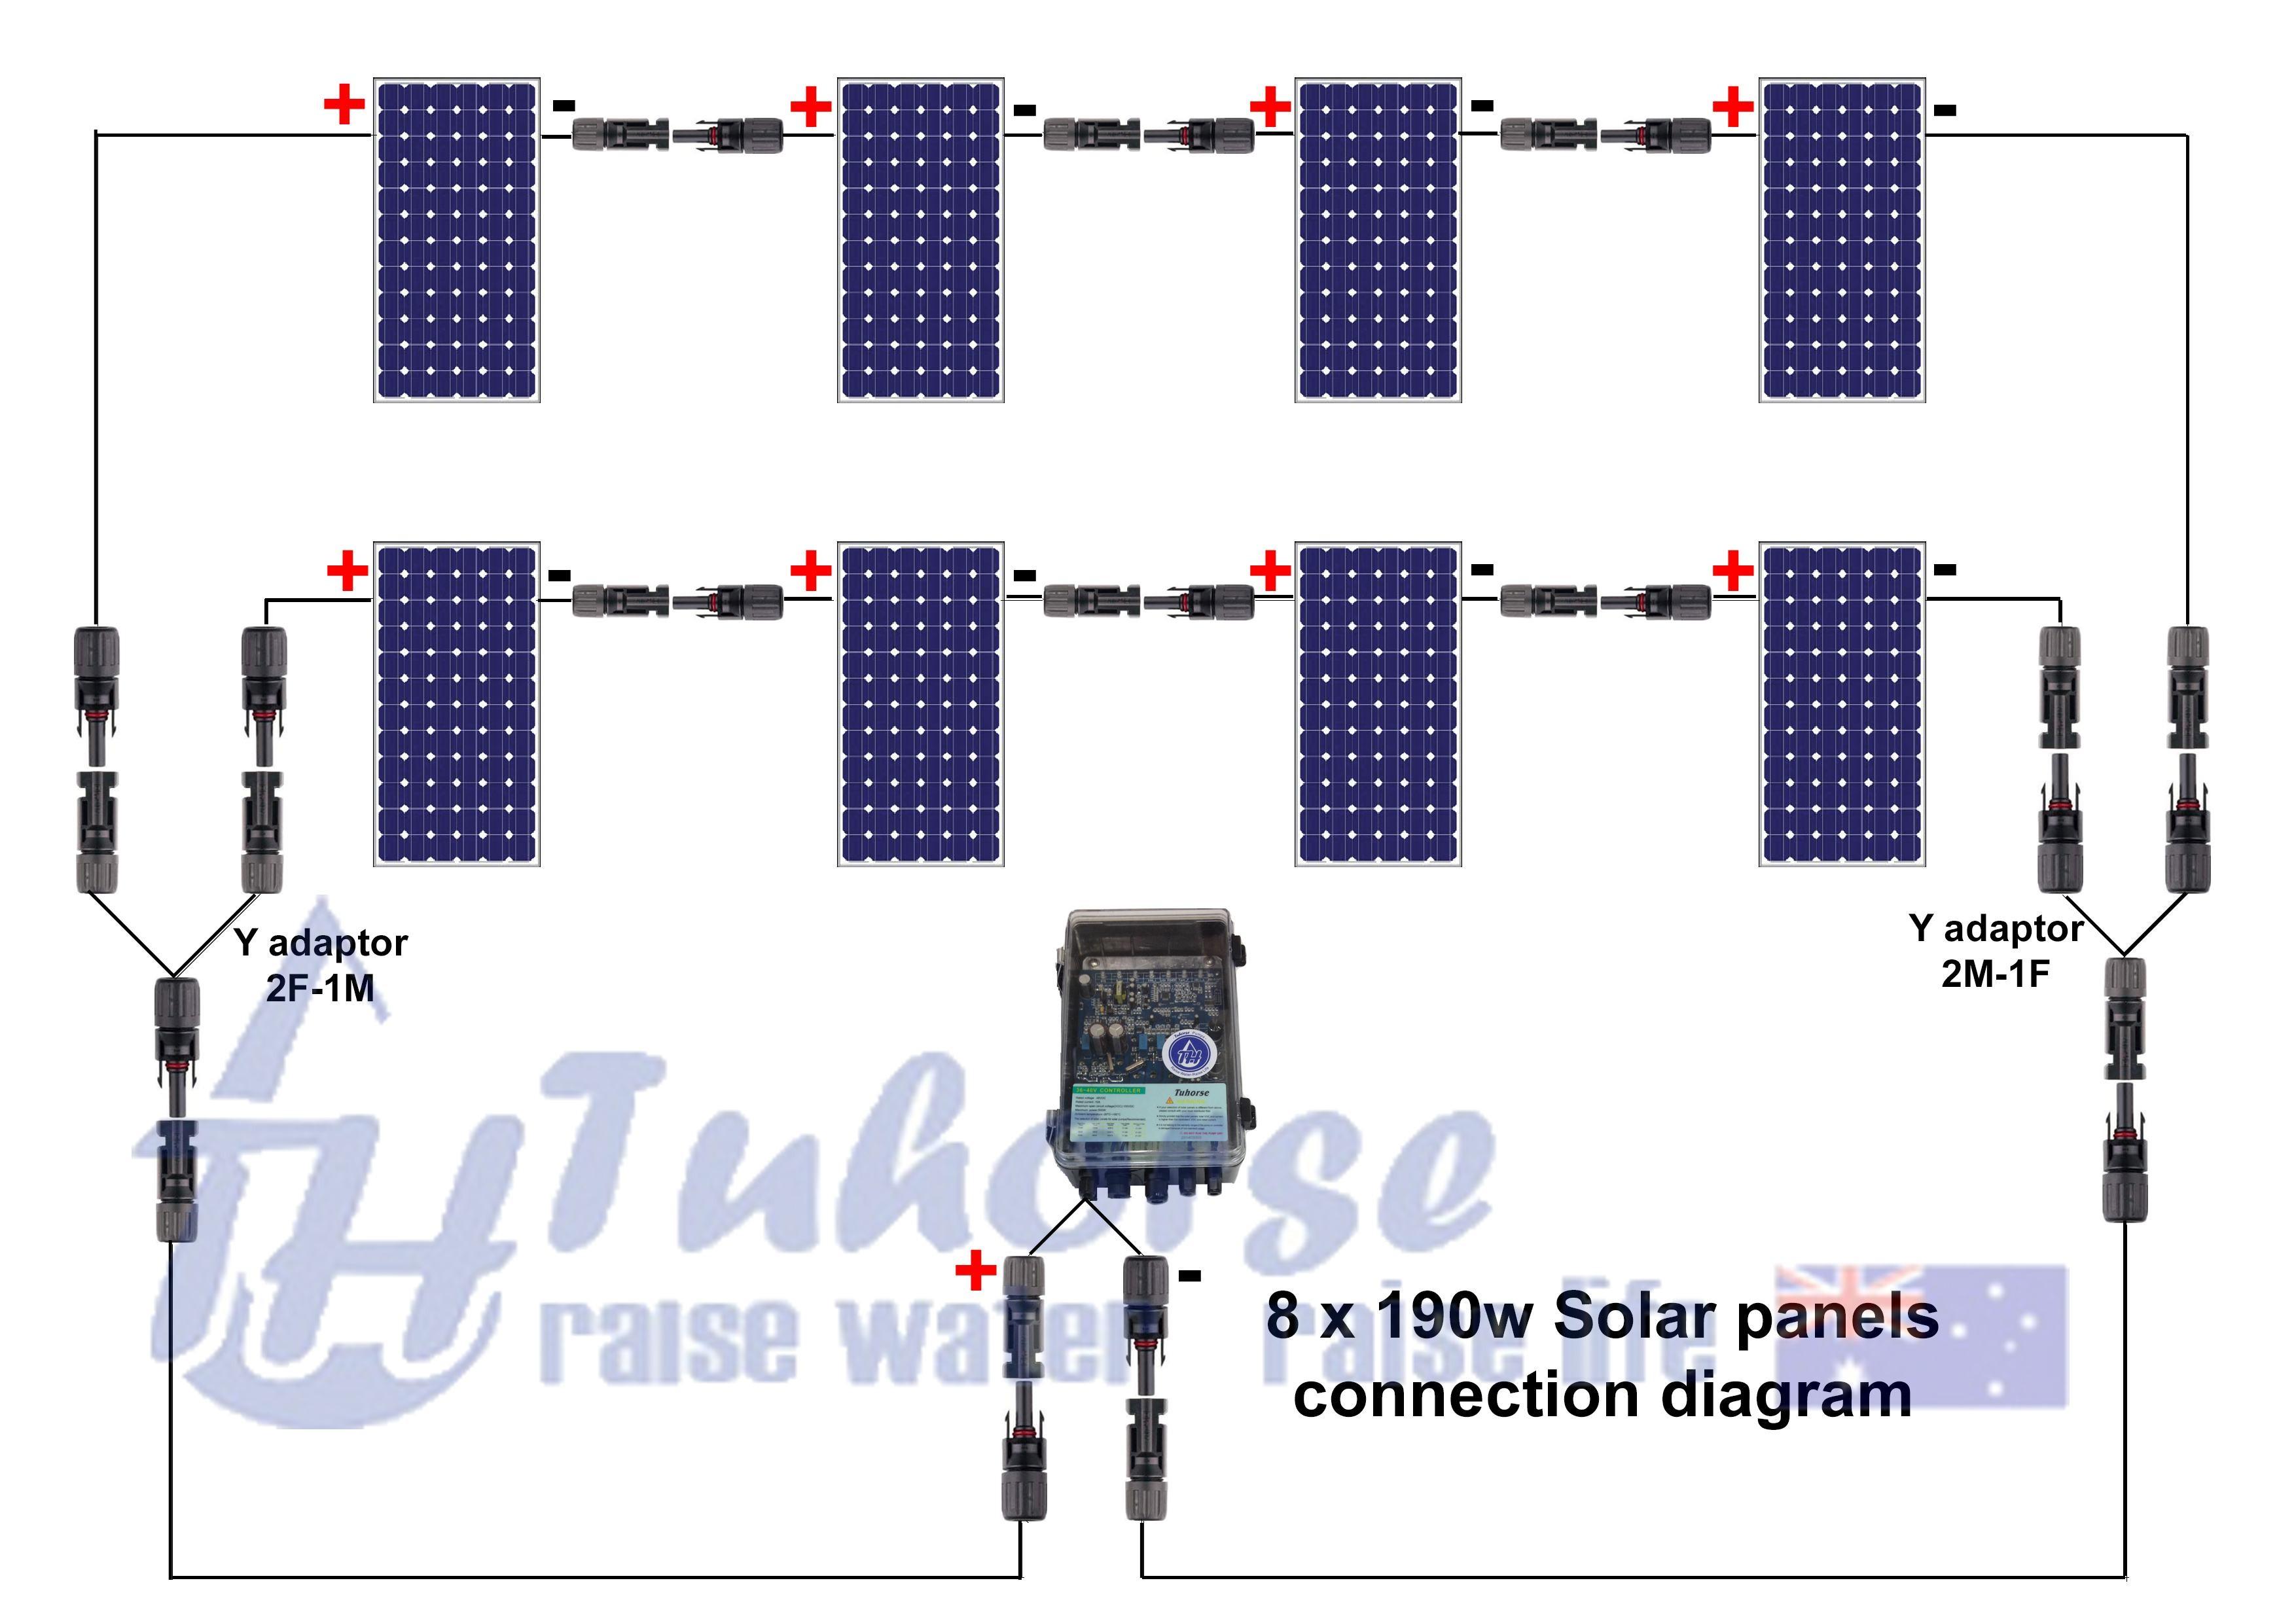 Solar Panel Wiring Diagrams Suresine Wiring Source - Solar combiner box wiring diagram